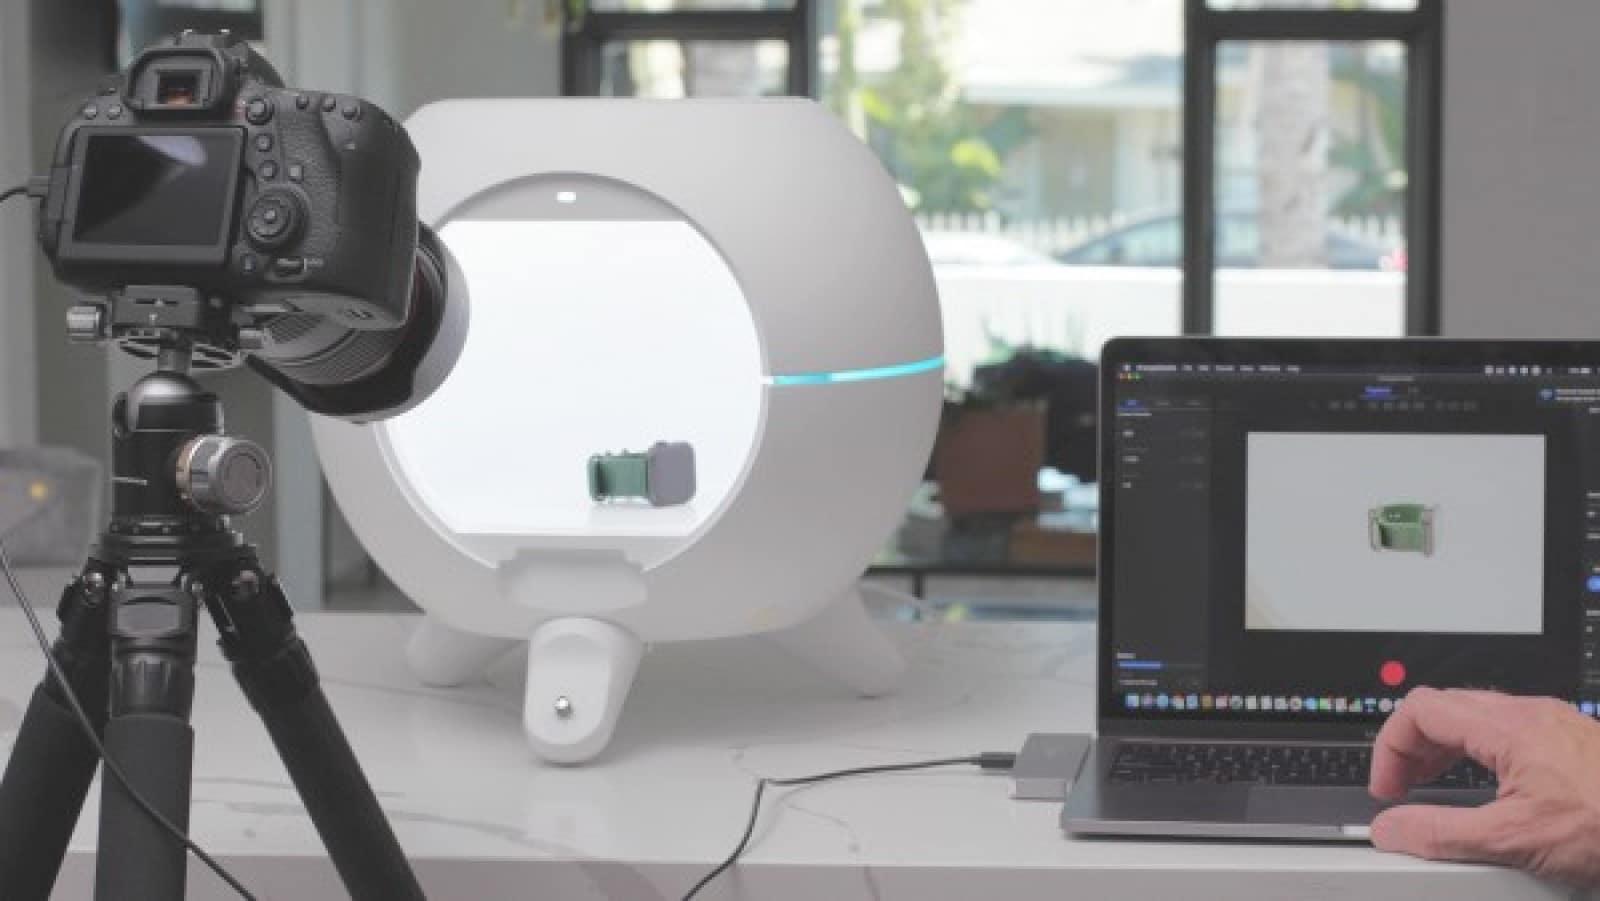 foldio360 smart dome photo booth